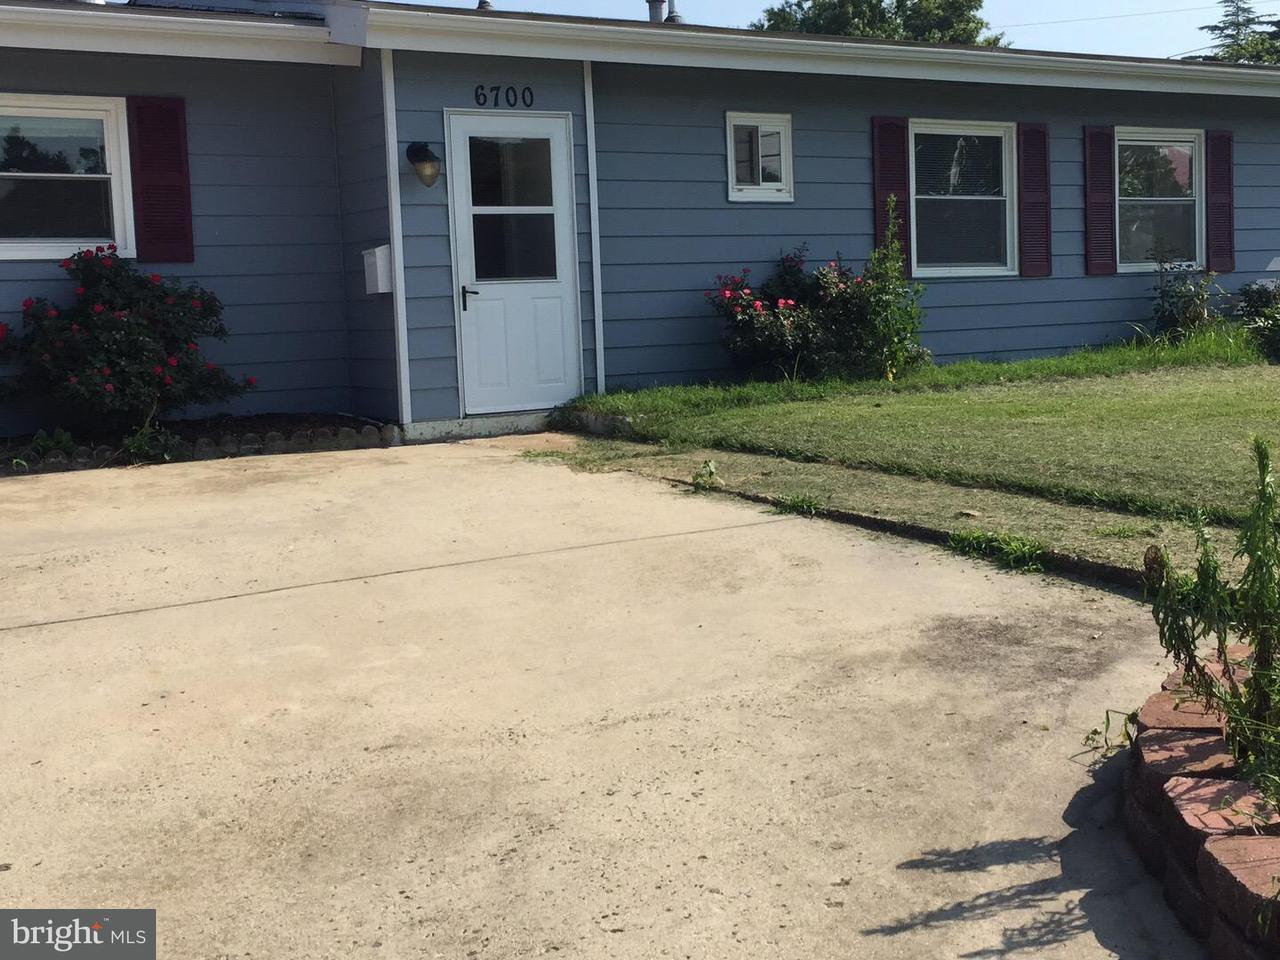 6700 Cimarron St, Springfield VA Real Estate Listing | MLS#  {g:Listing:MLS_Number)